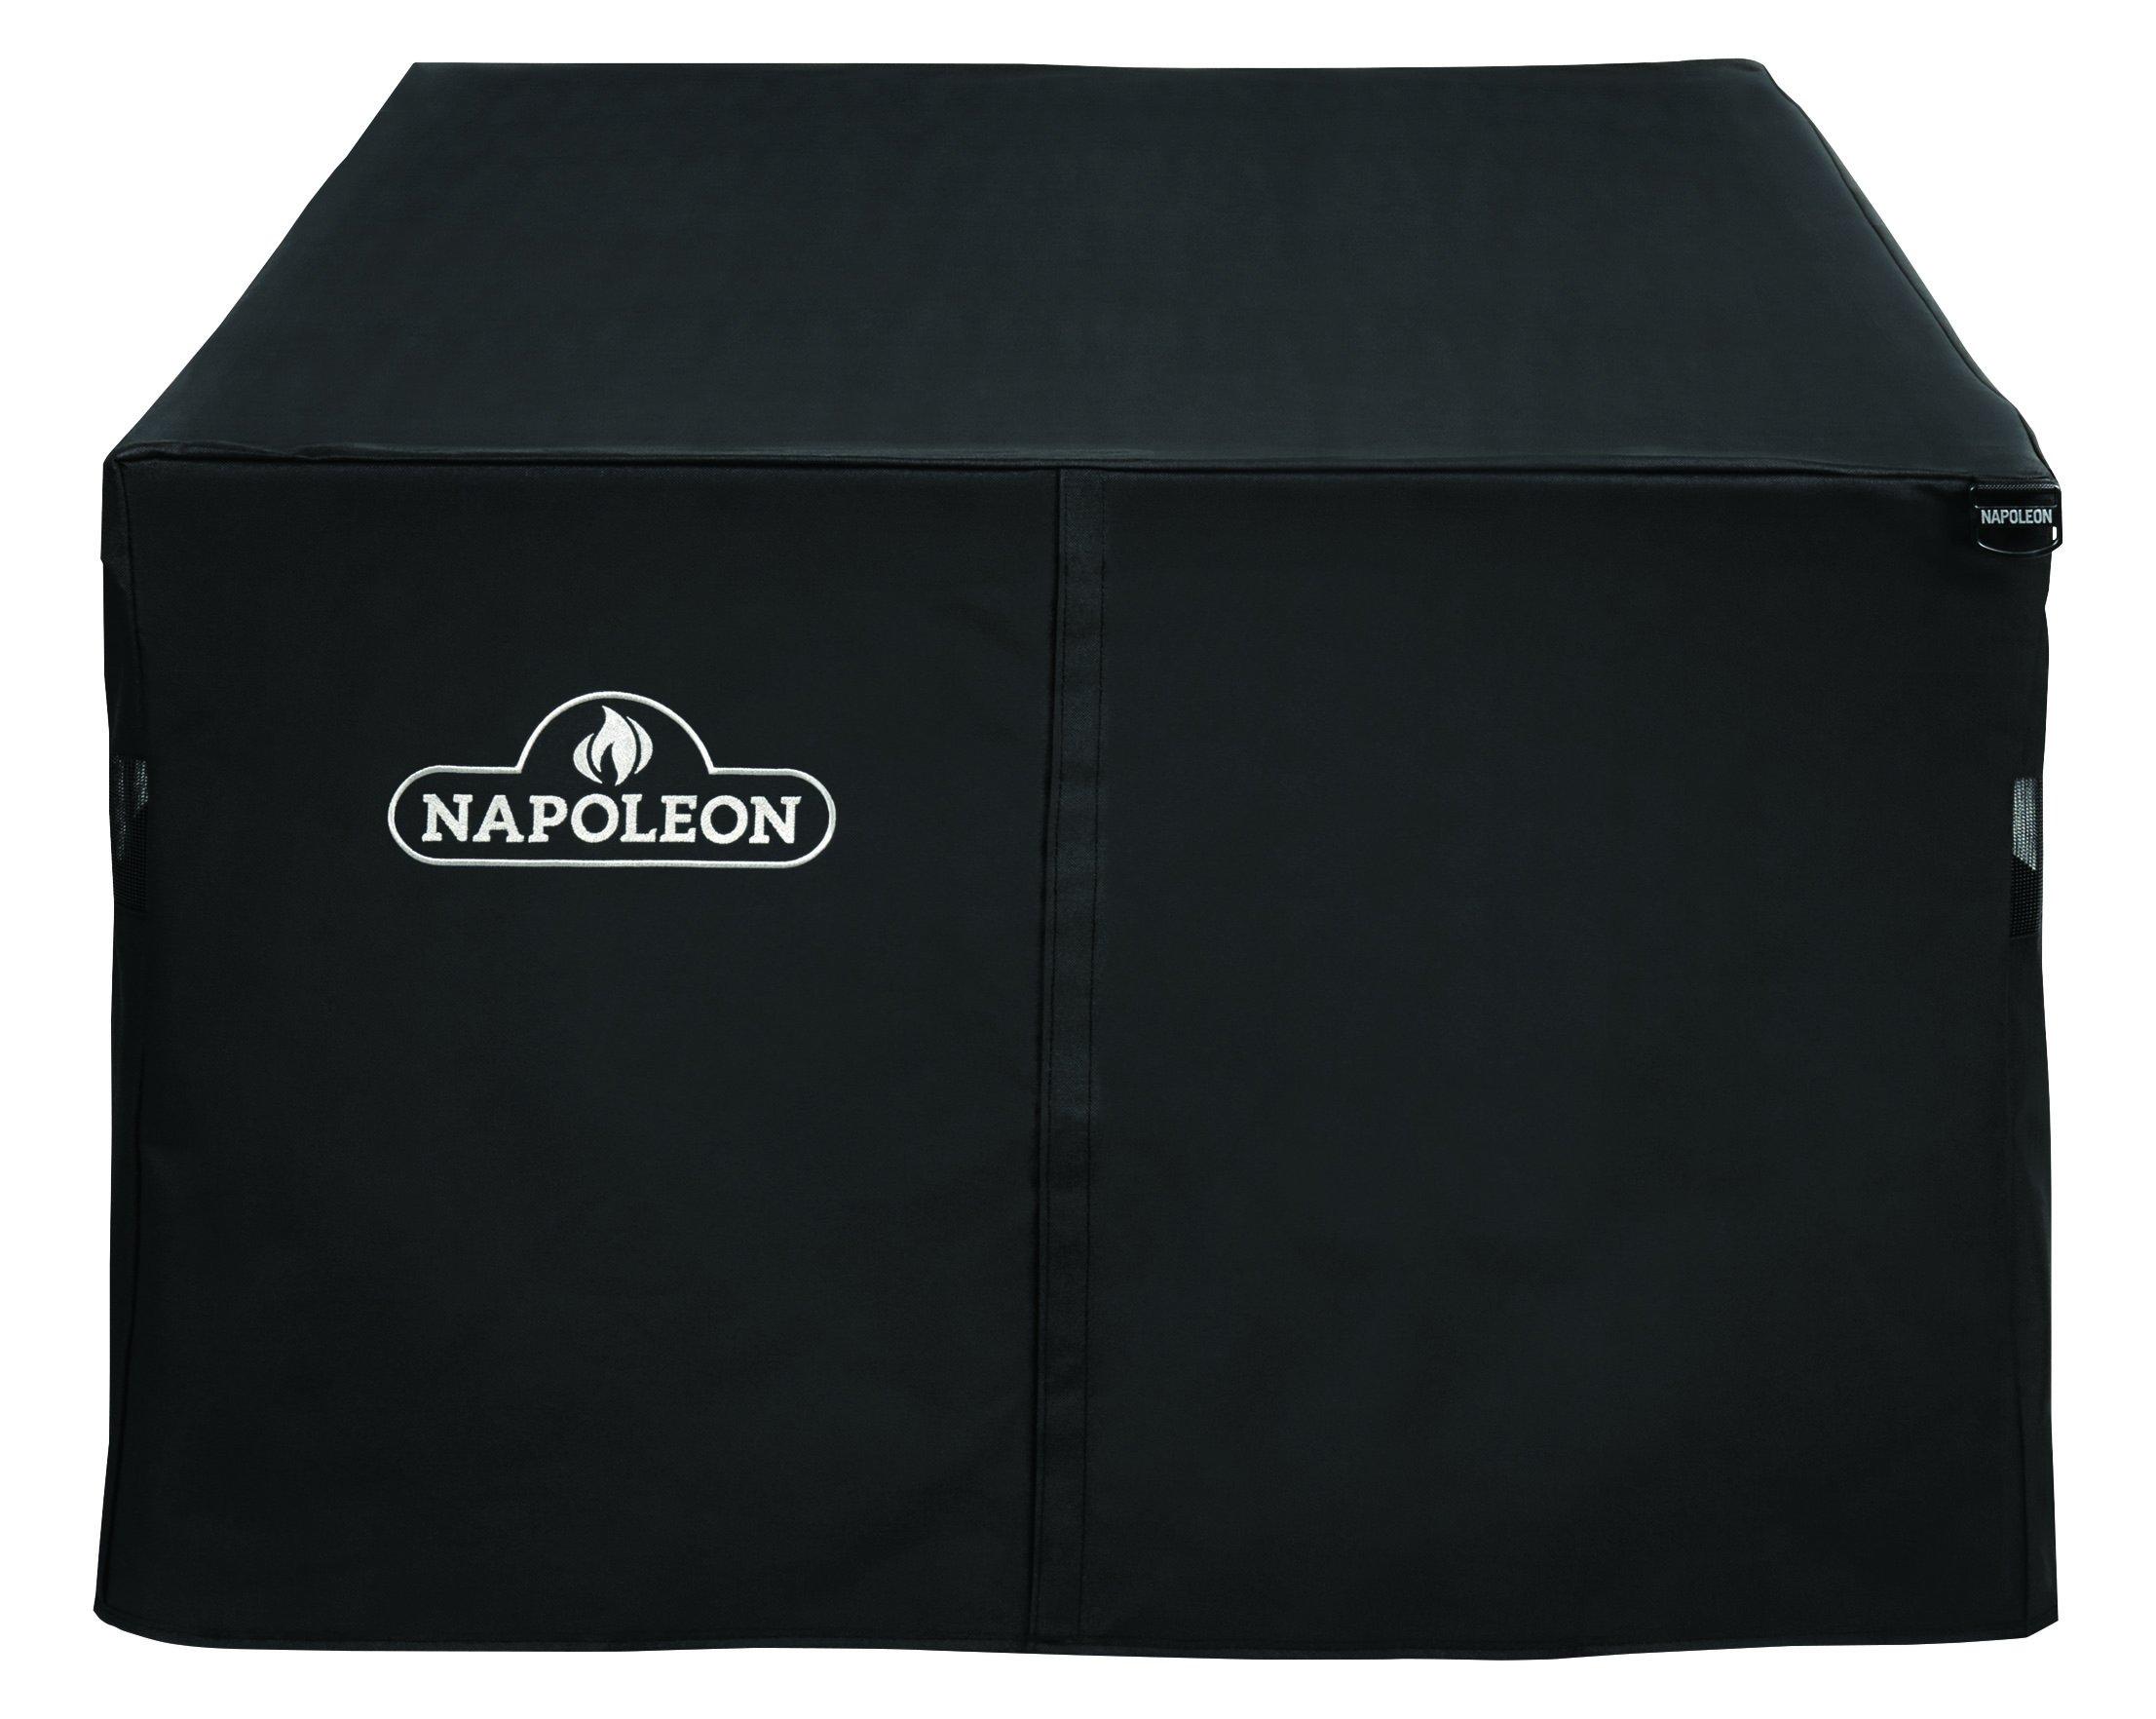 Napoleon Grills 61851 Premium Patioflame Table Cover by Napoleon